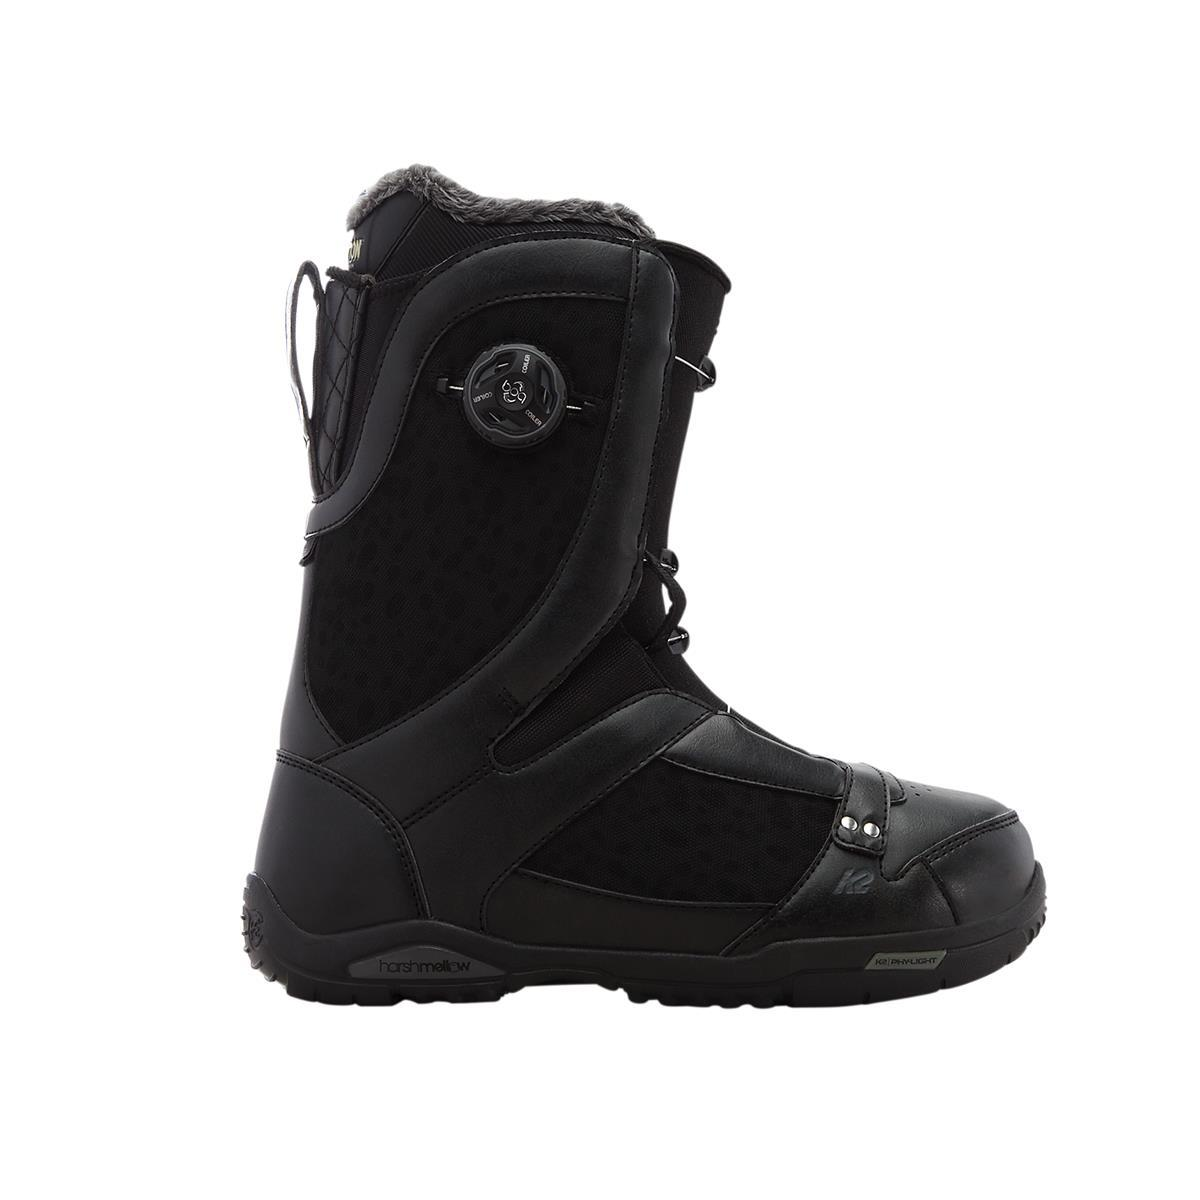 b92cf12408b0 Snowboardové topánky - Eski